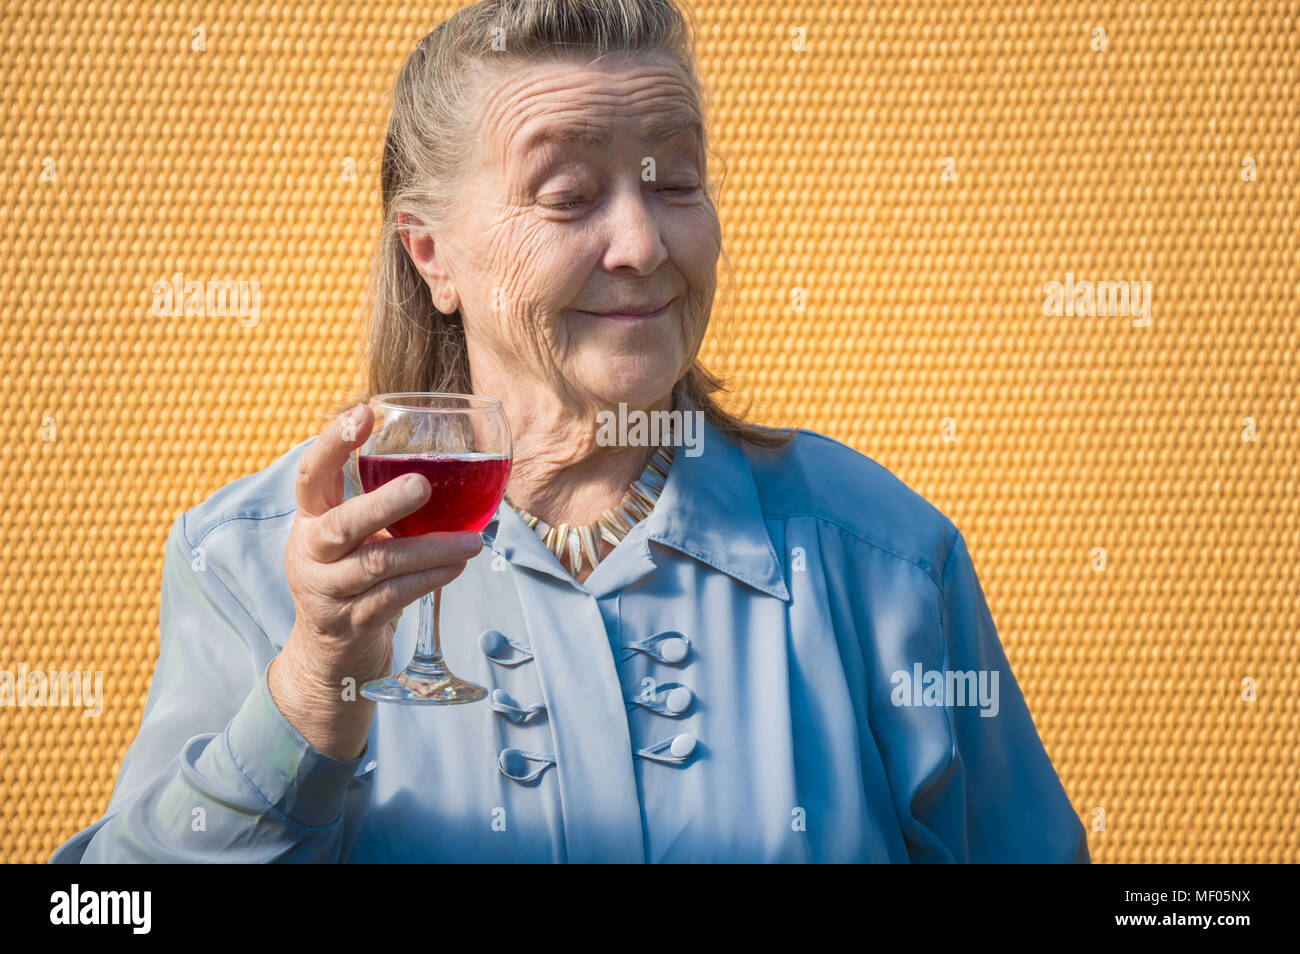 Retro Wine Drinking Lady Immagini   Retro Wine Drinking Lady Fotos ... b7c7a4f04a17